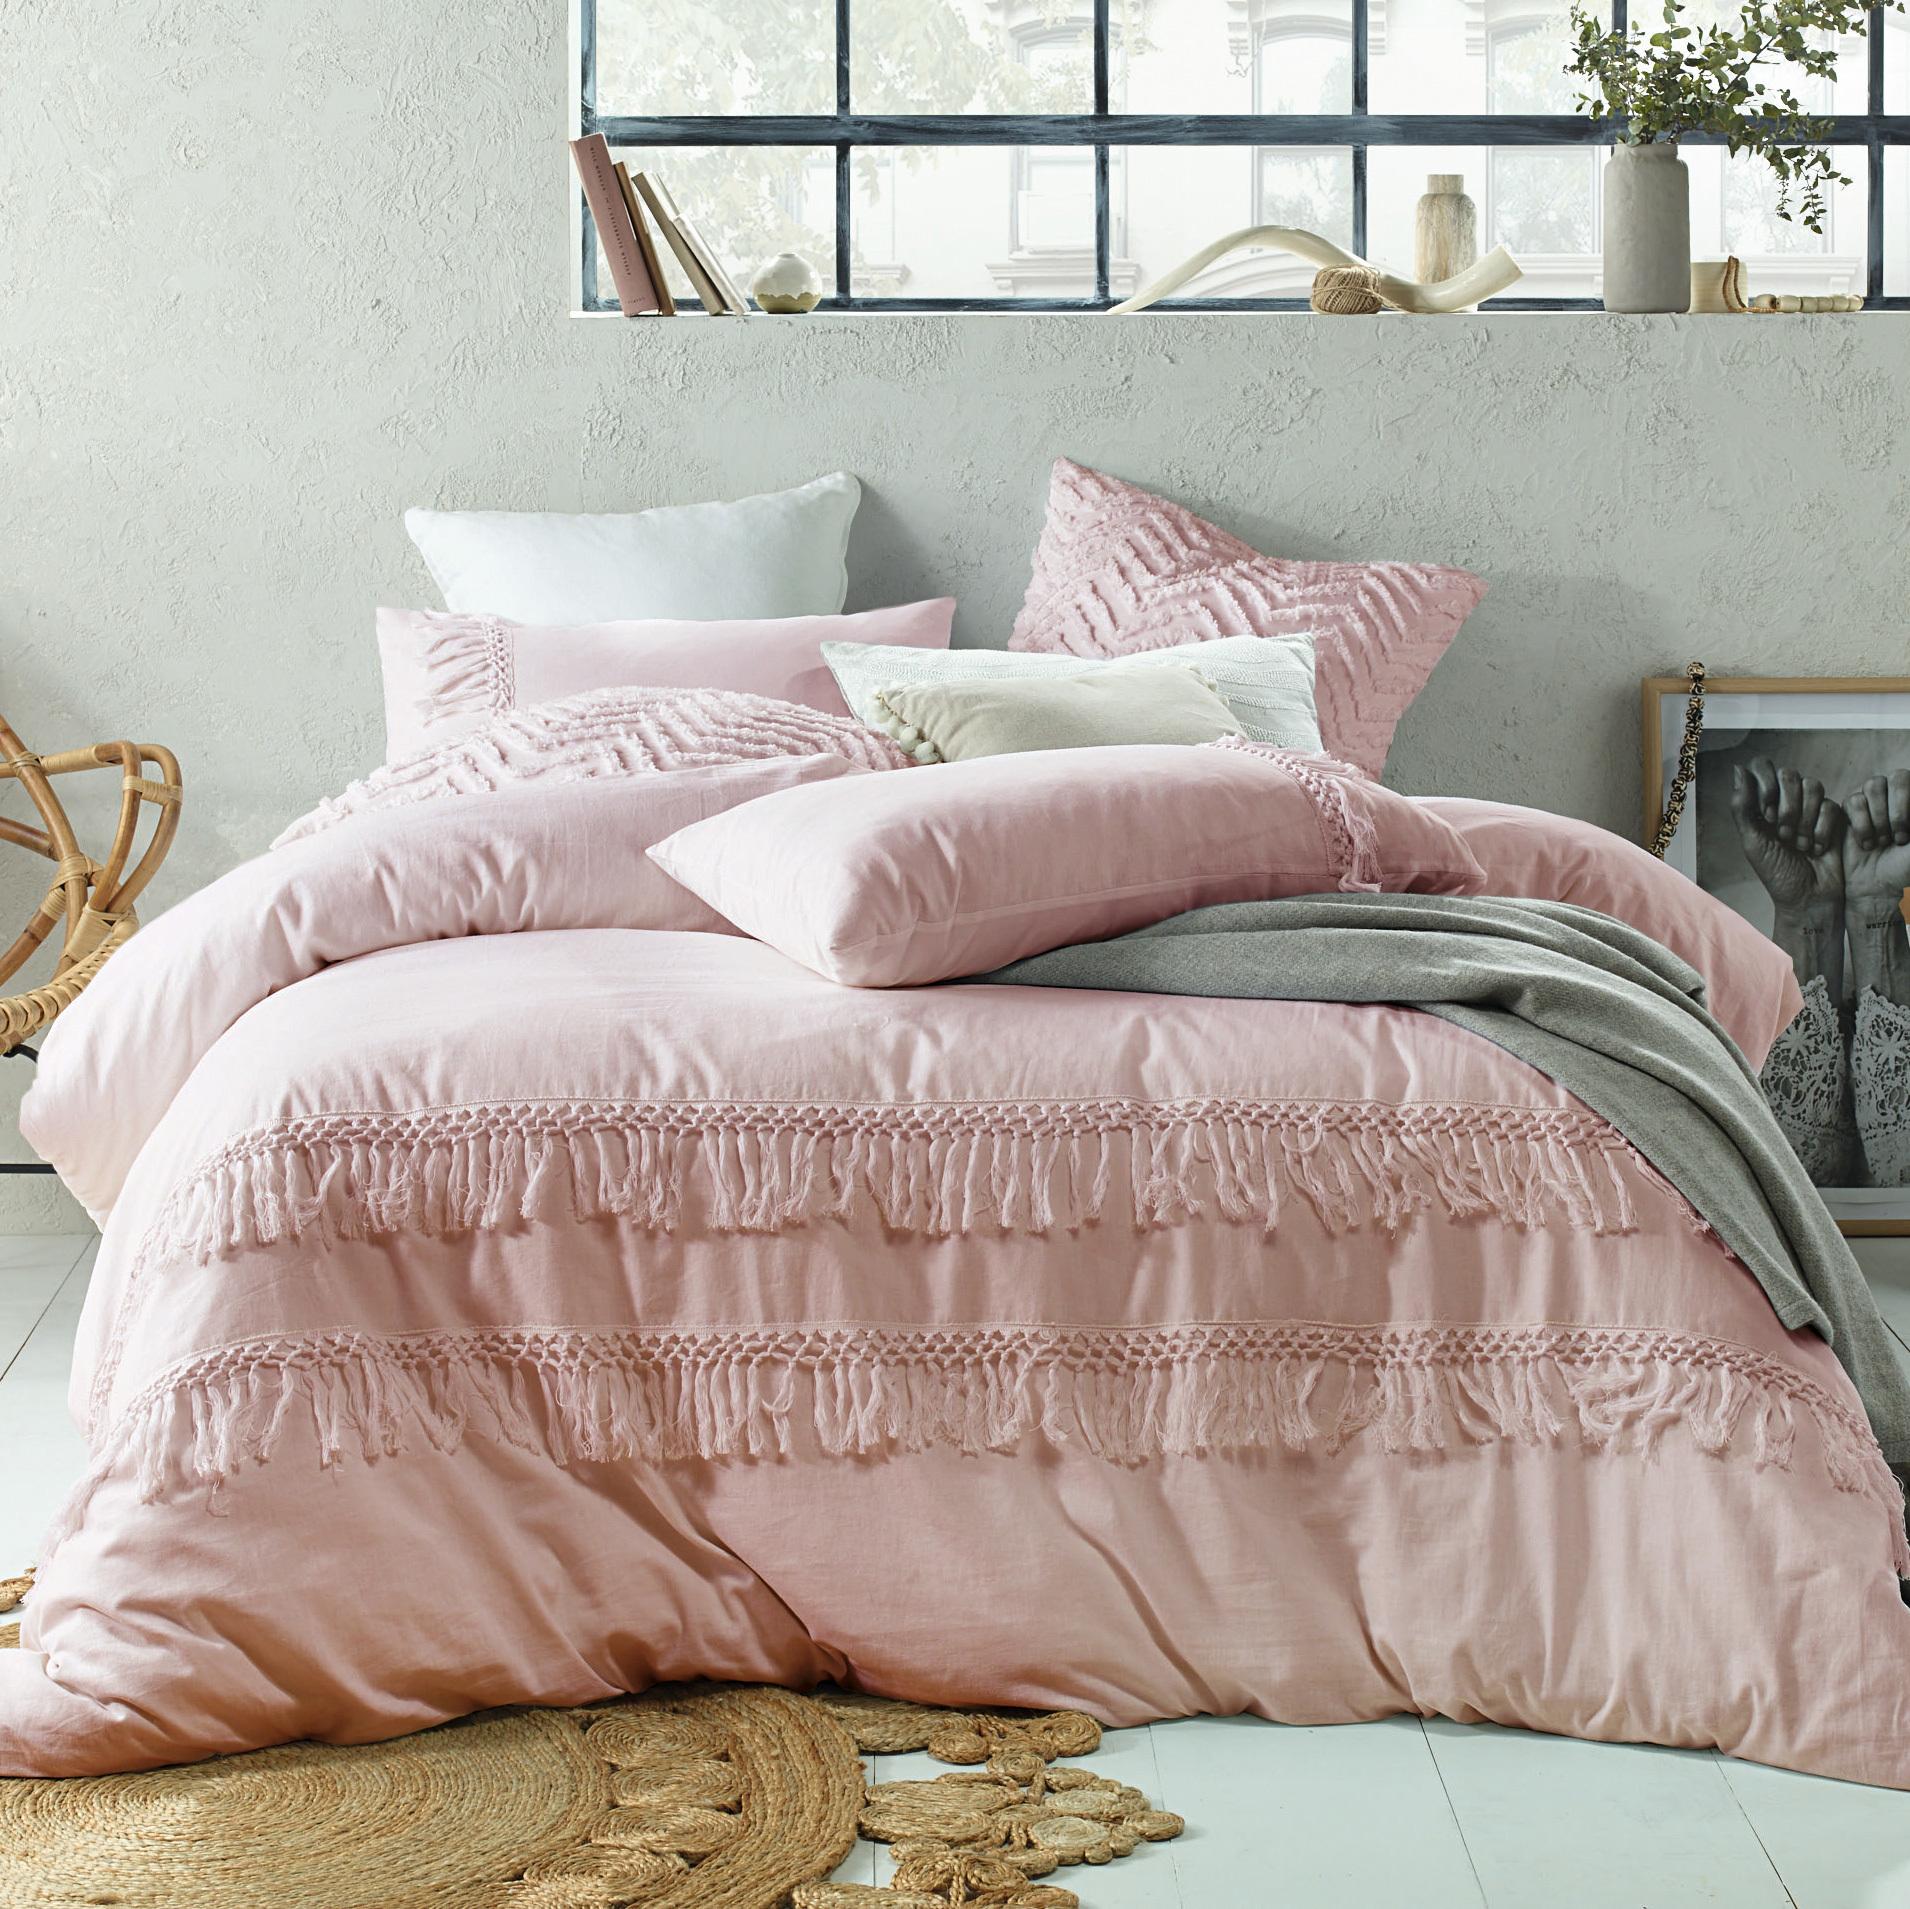 piece set lodge quilt home com full queen amazon dp greenland kitchen whitetail